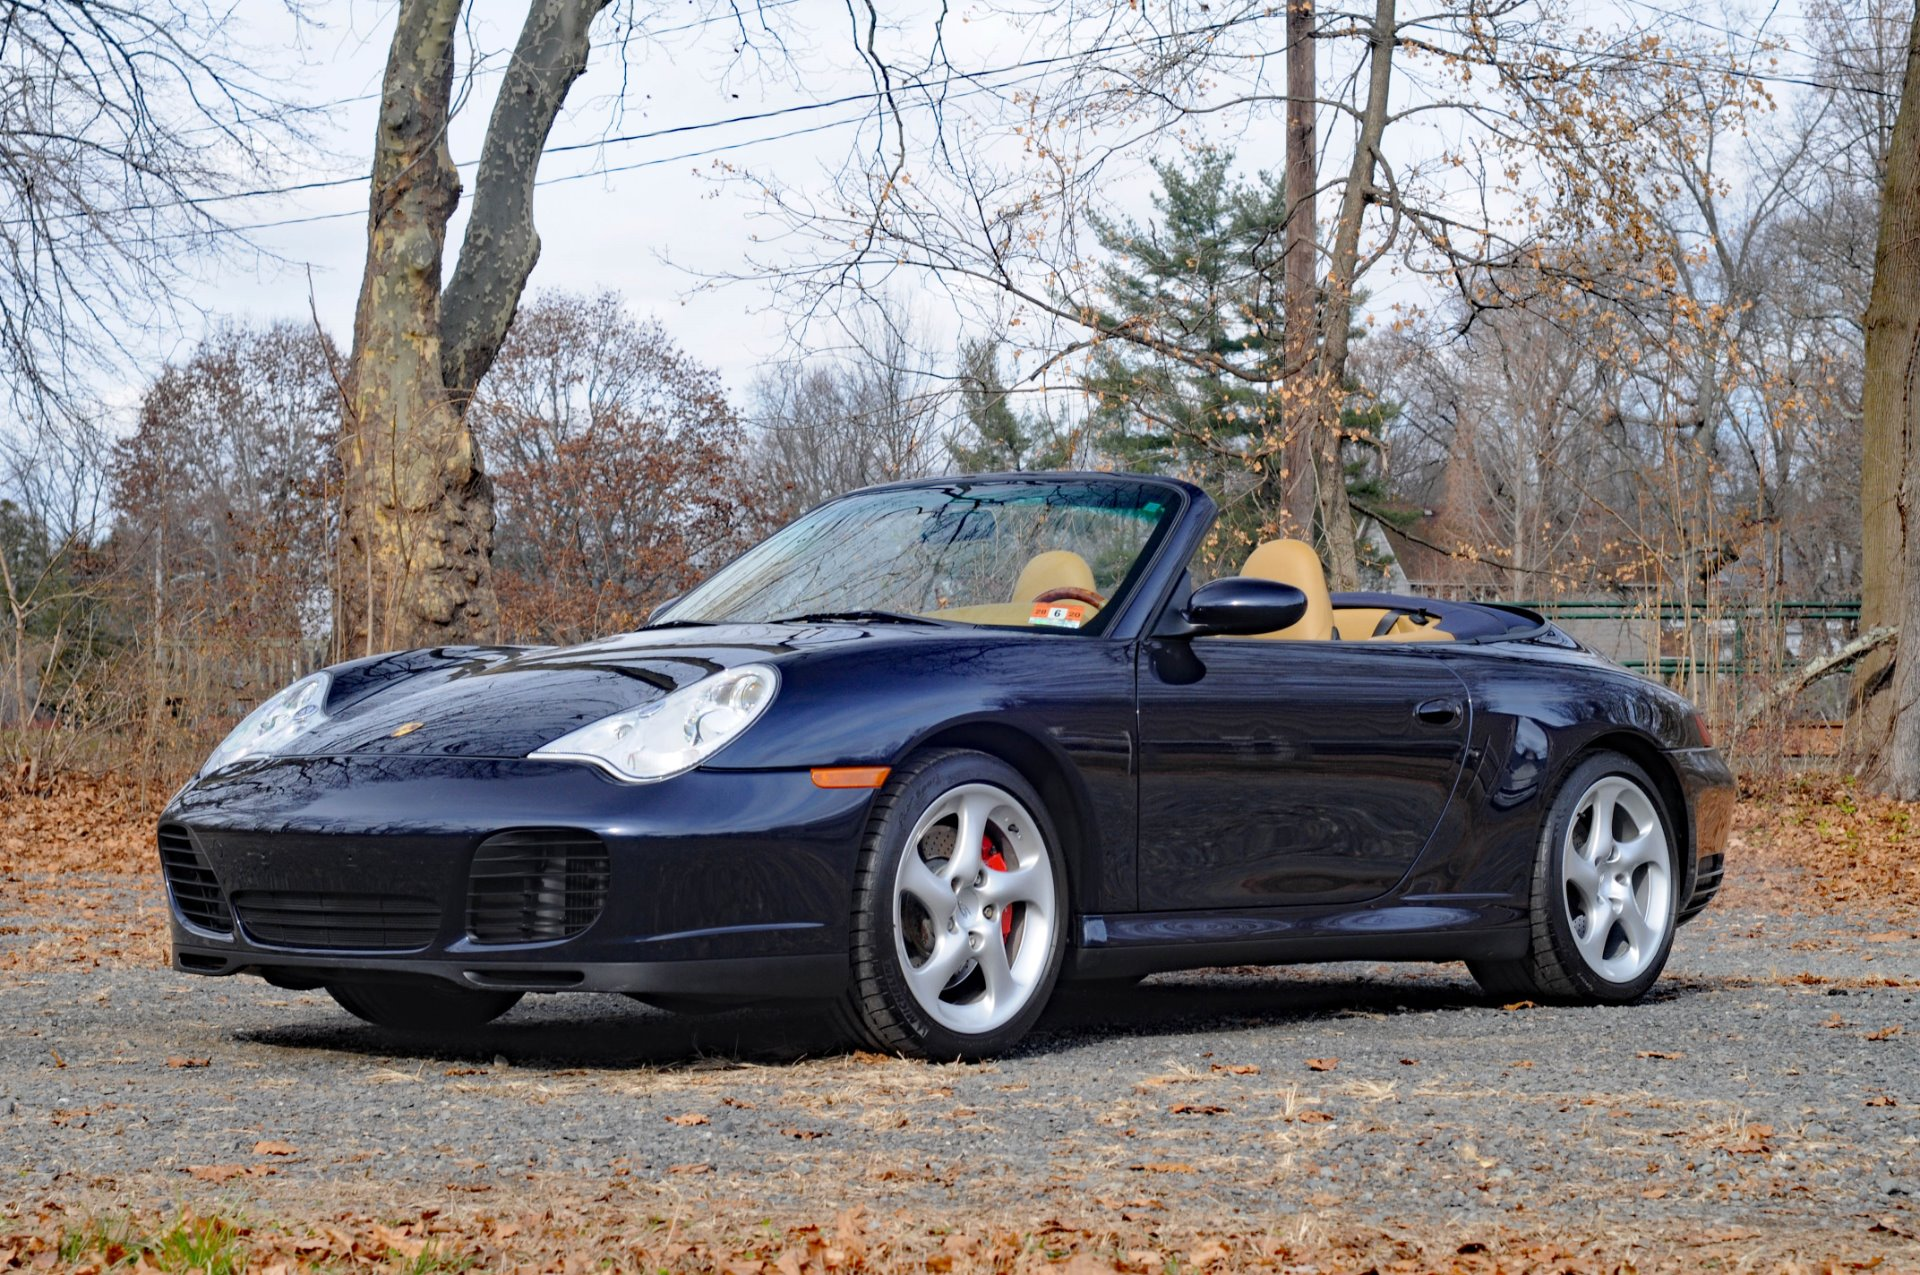 Used 2004 Porsche 911 Carrera 4S Cabriolet  | Peapack, NJ